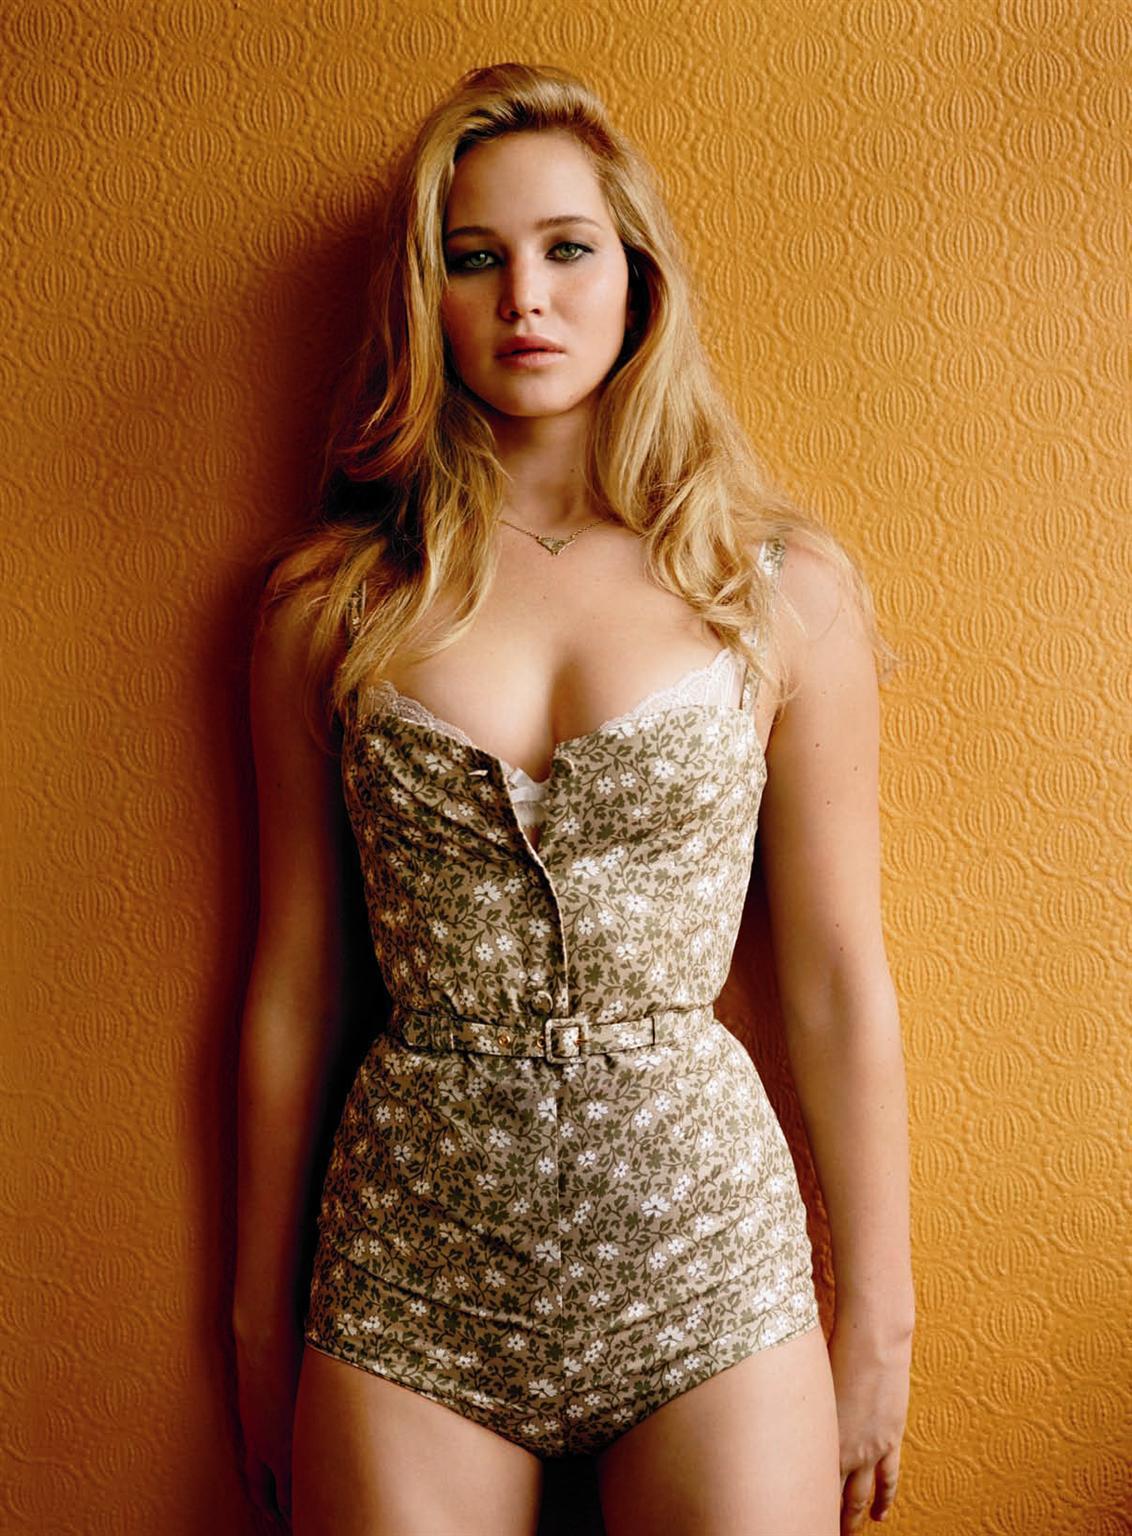 Celebrities in Hot Bikini: Jennifer Lawrence - Hunger Games Star in Bikini